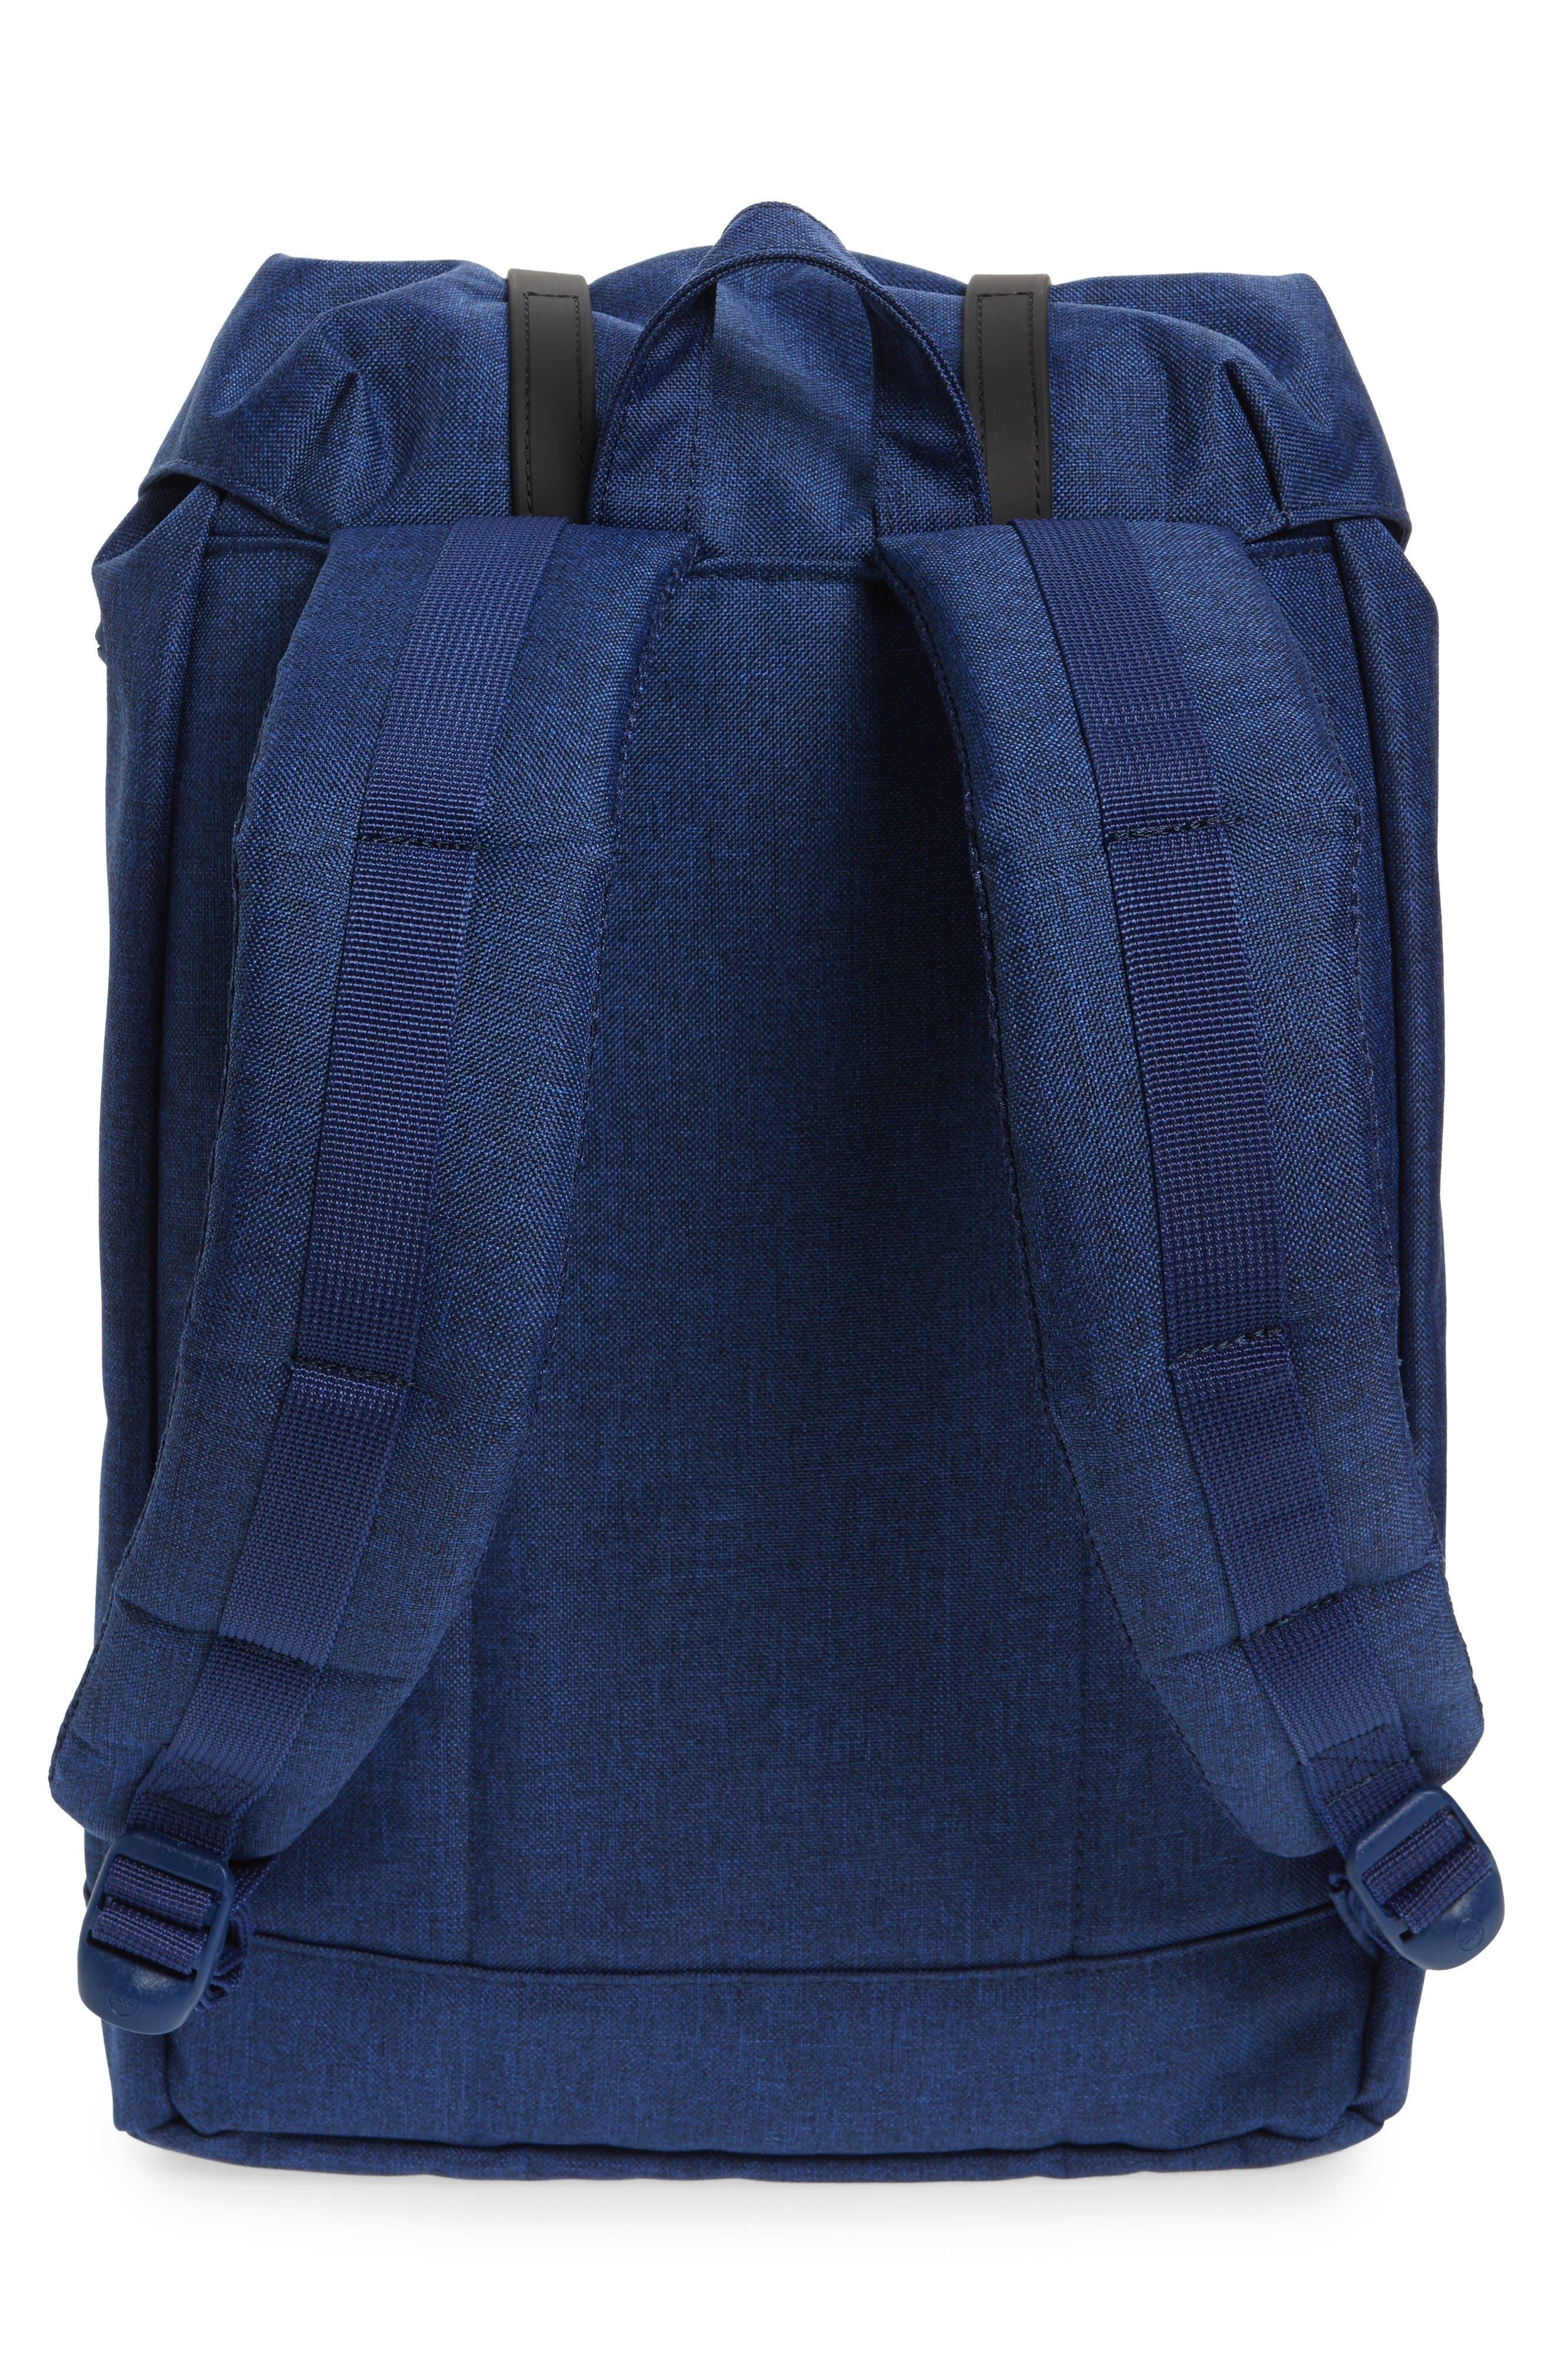 Alternate Image 3  - Herschel Supply Co. Retreat Backpack